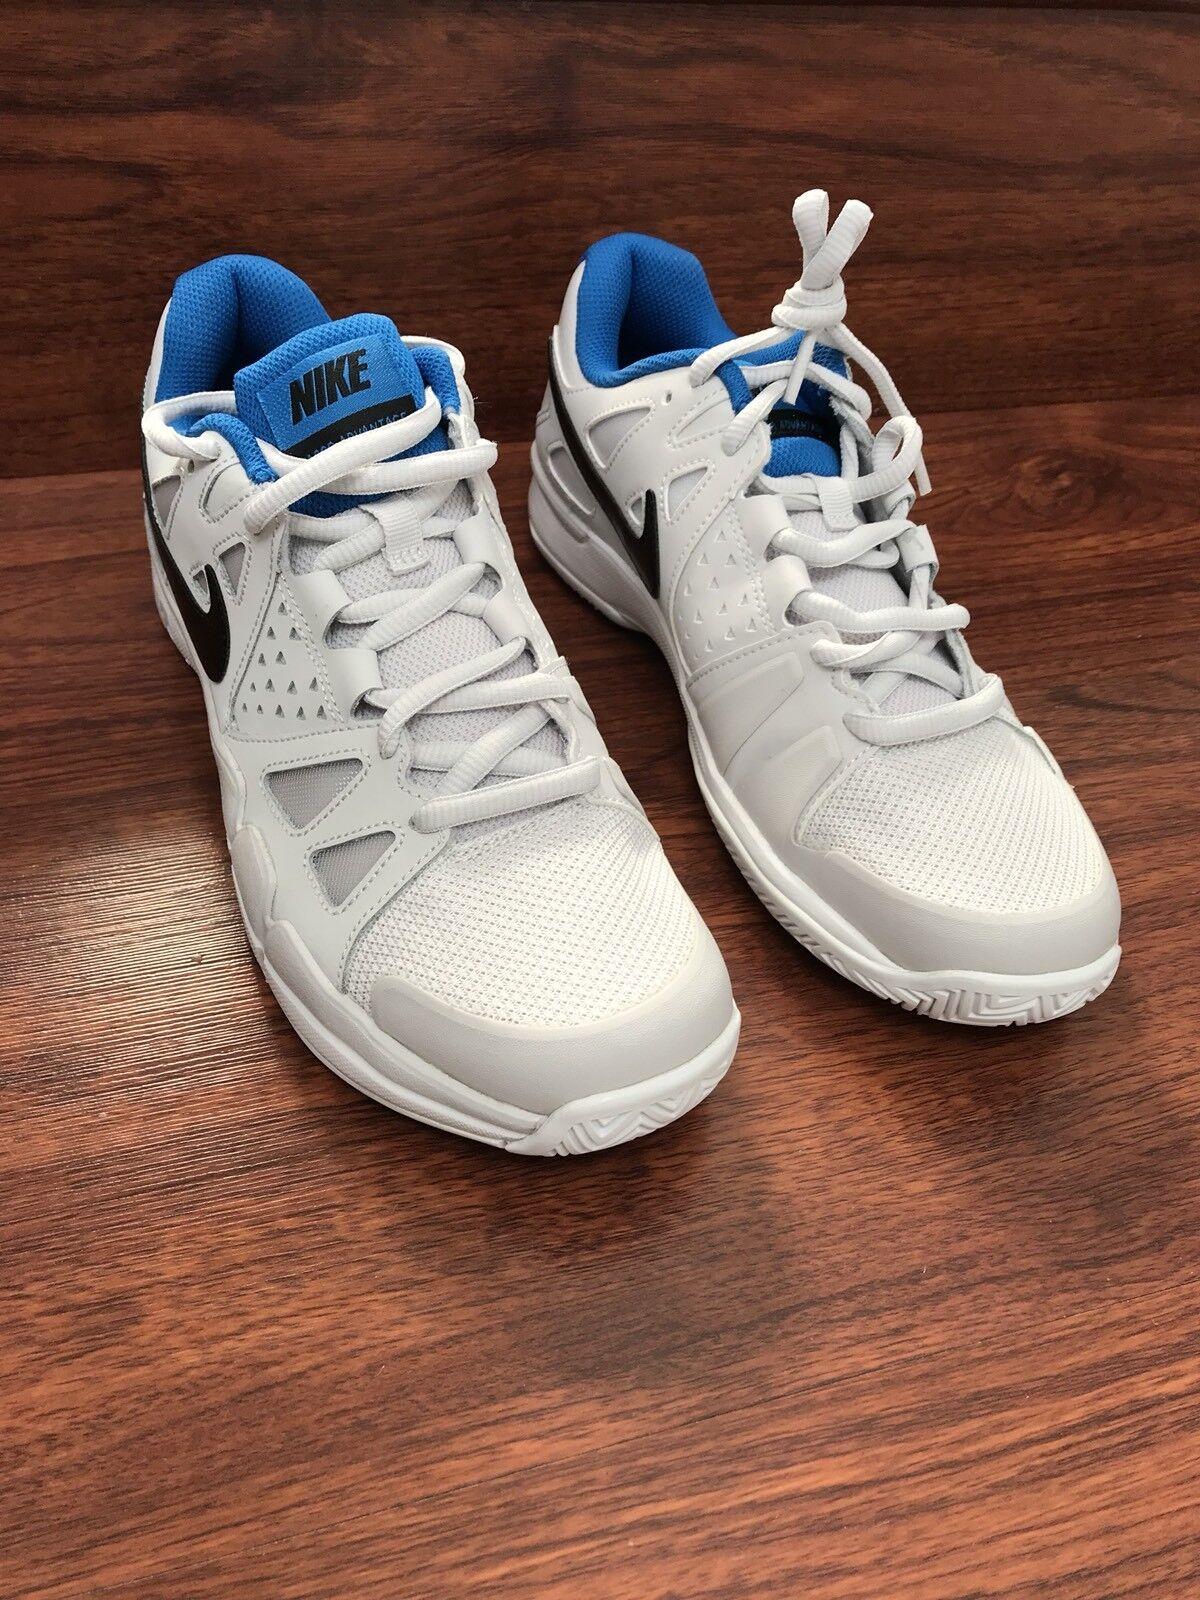 9e6d4b44463 Nike Air Vapor Advantage Mens Mens Mens Tennis Shoes Size 7.5  NEW 0d4b17